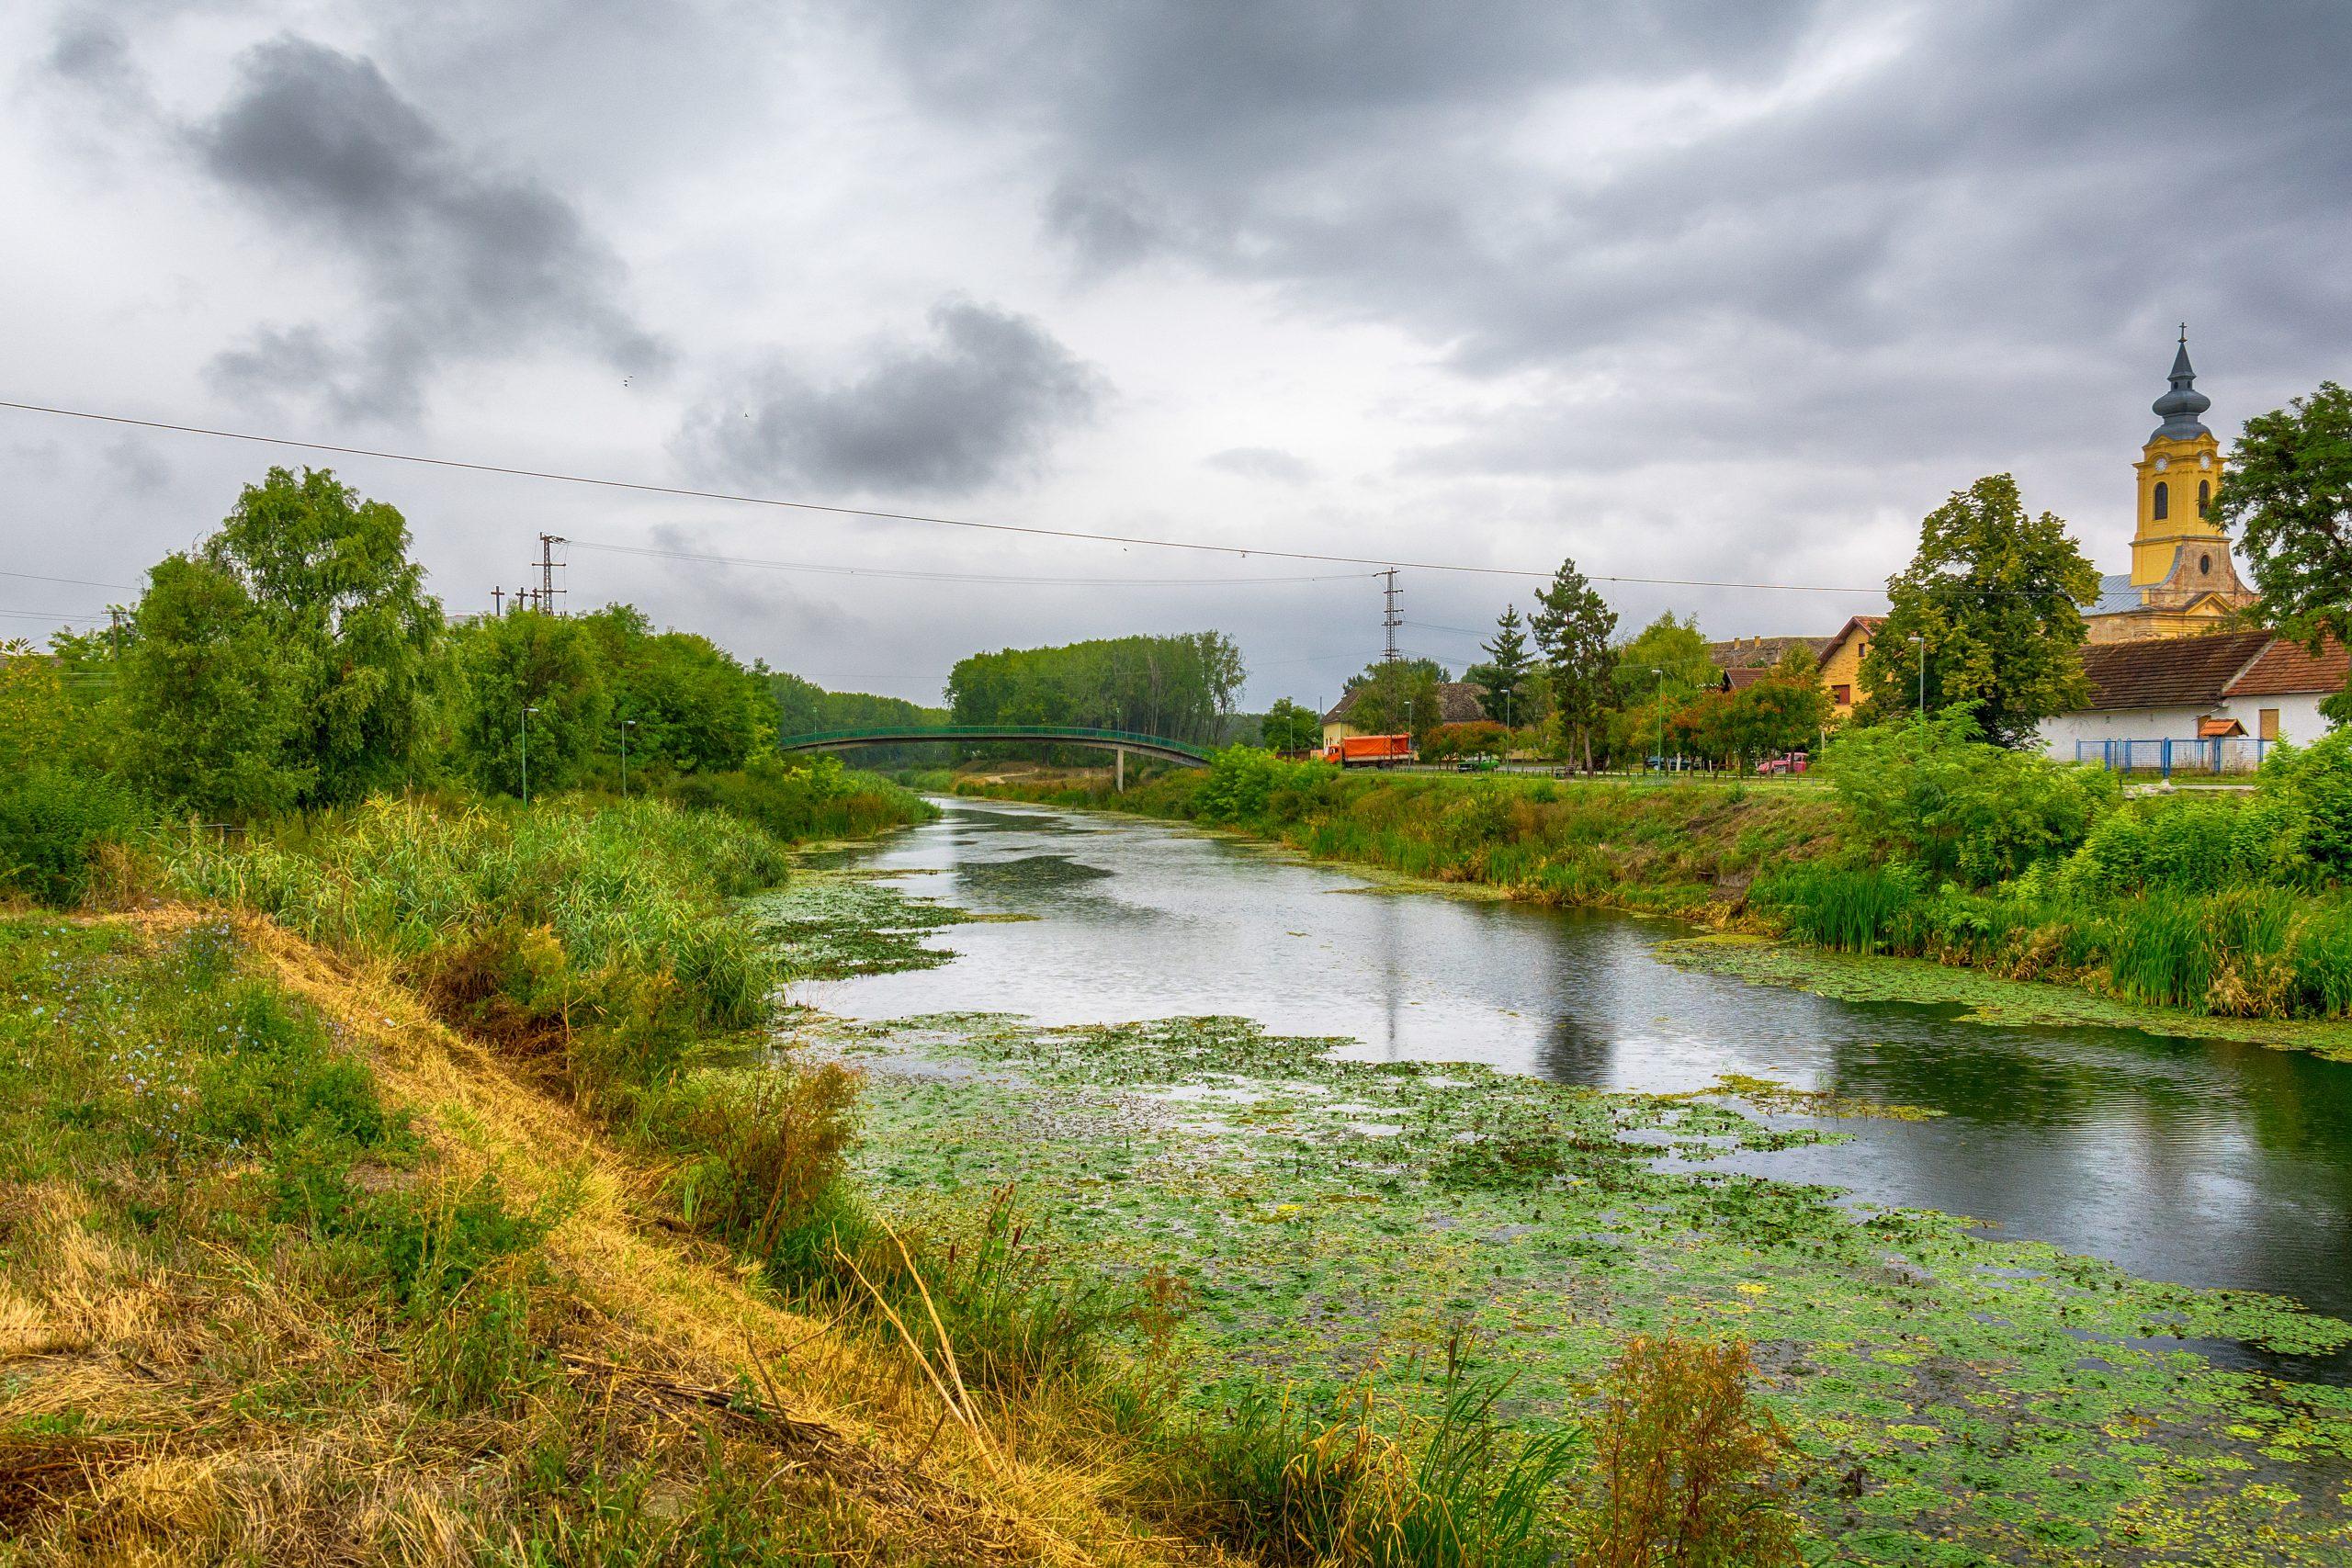 Duna Tisa Dunav, Dunav, Tisa, Dunav, kanal